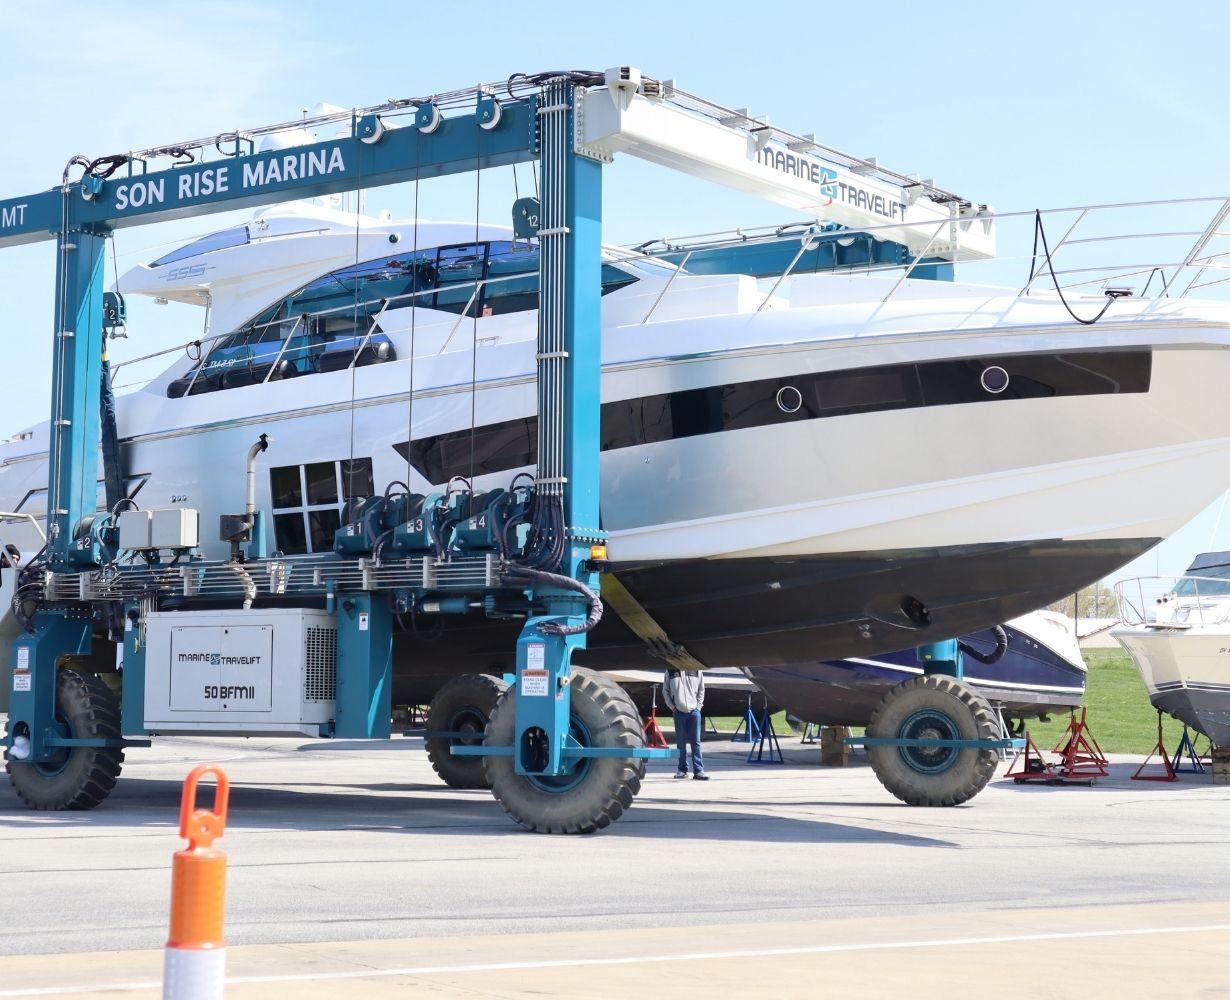 son-rise-marina-sandusky-ohio-gallery-boat-3